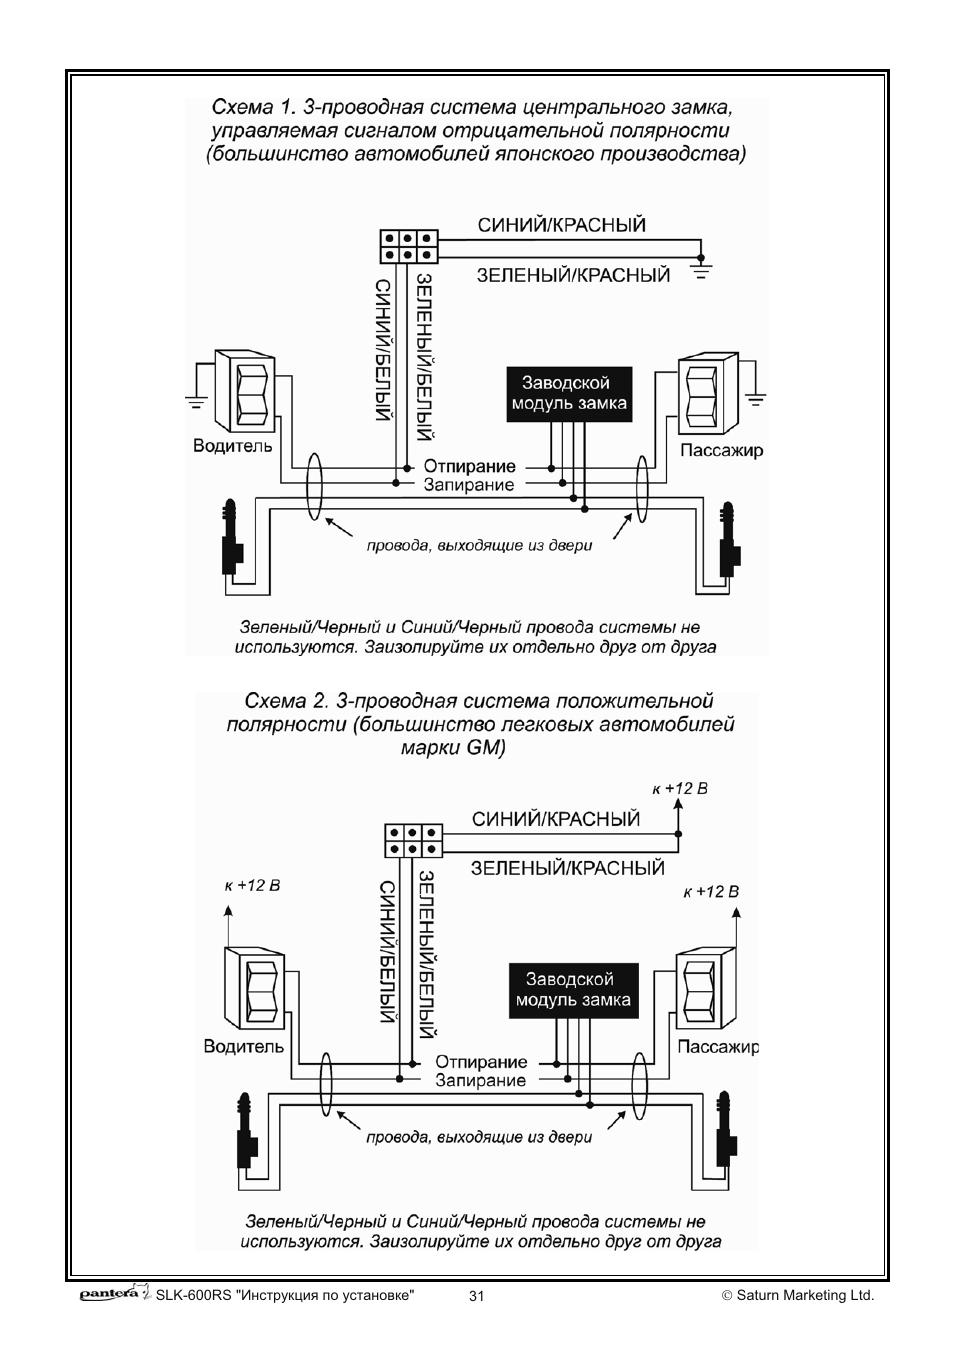 сигнализация аллигатор s 875rs инструкция по установке